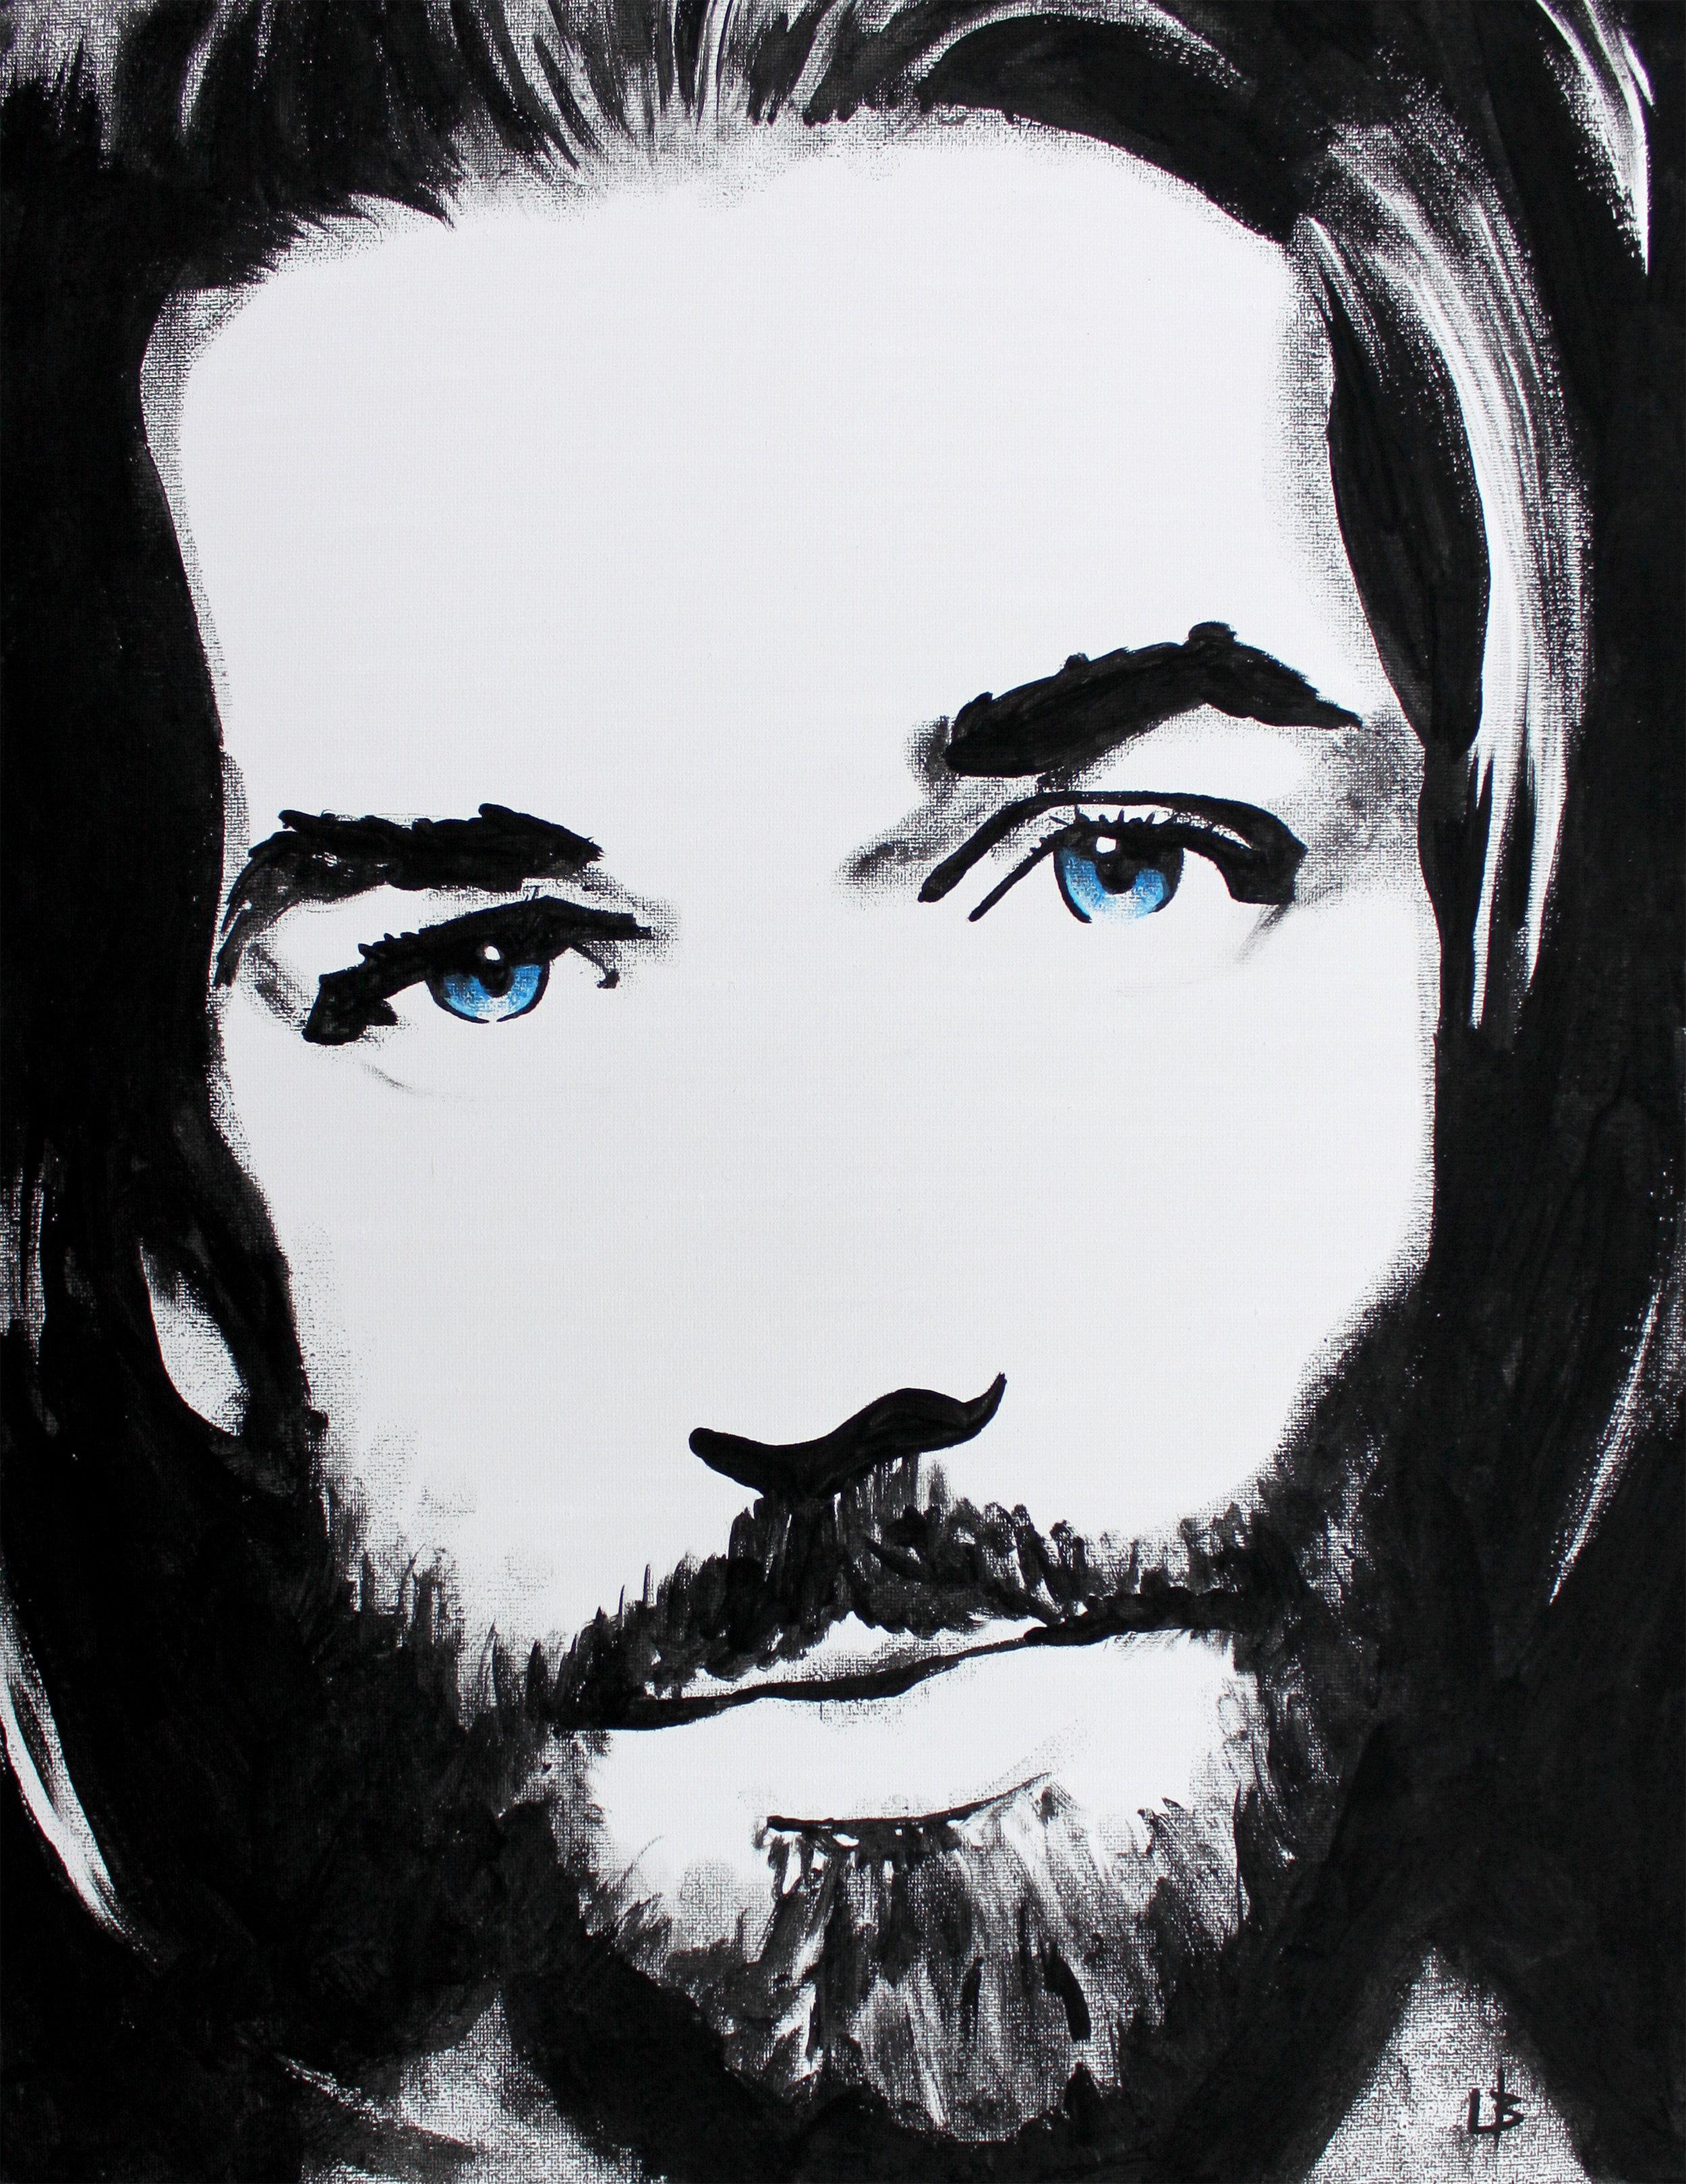 Christian Painter